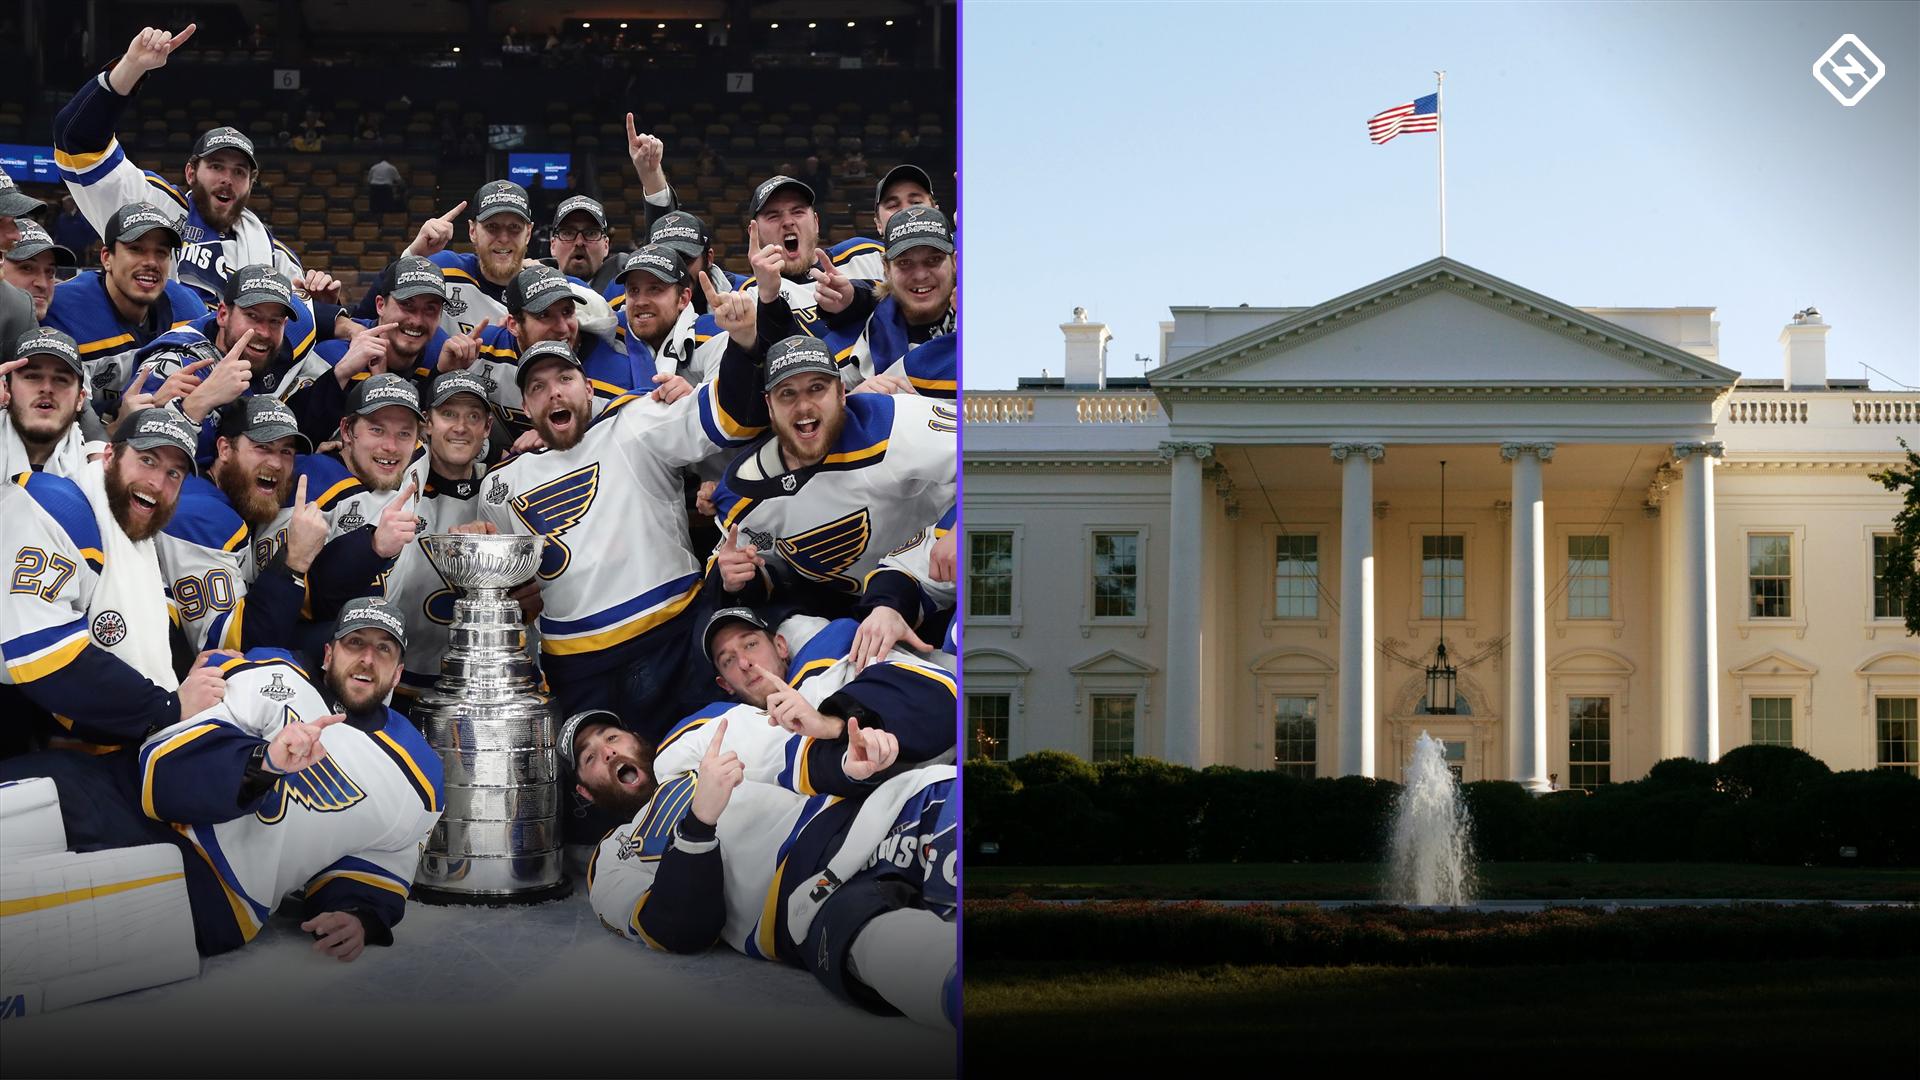 St. Louis Blues visit the White House